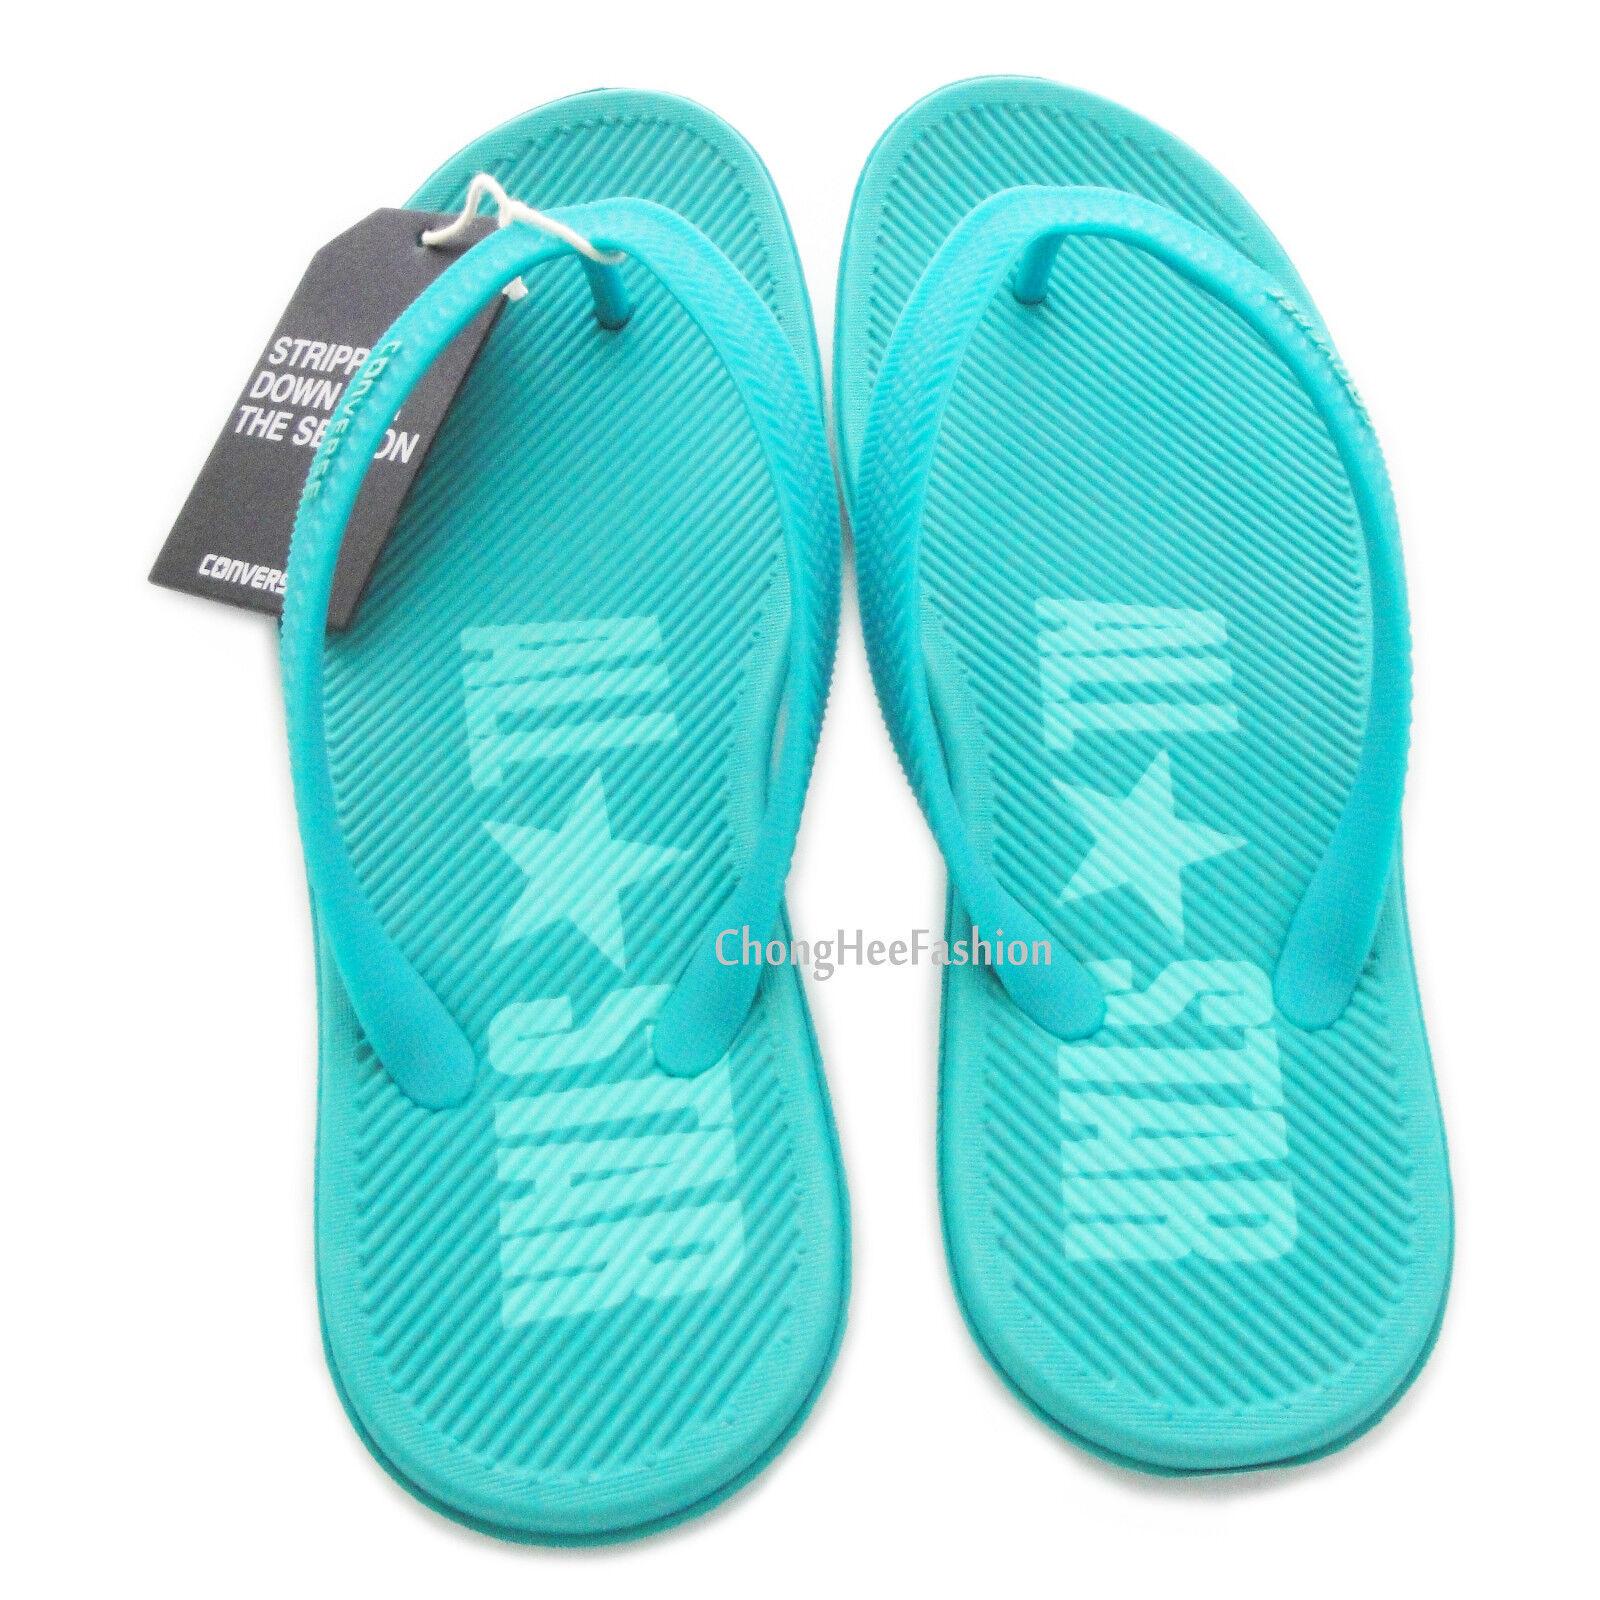 6834edd32e4517 Converse Sand Stap All All All Star Thong Flip Flops Unisex Sandals Beach  Summer Shoes 2f560b